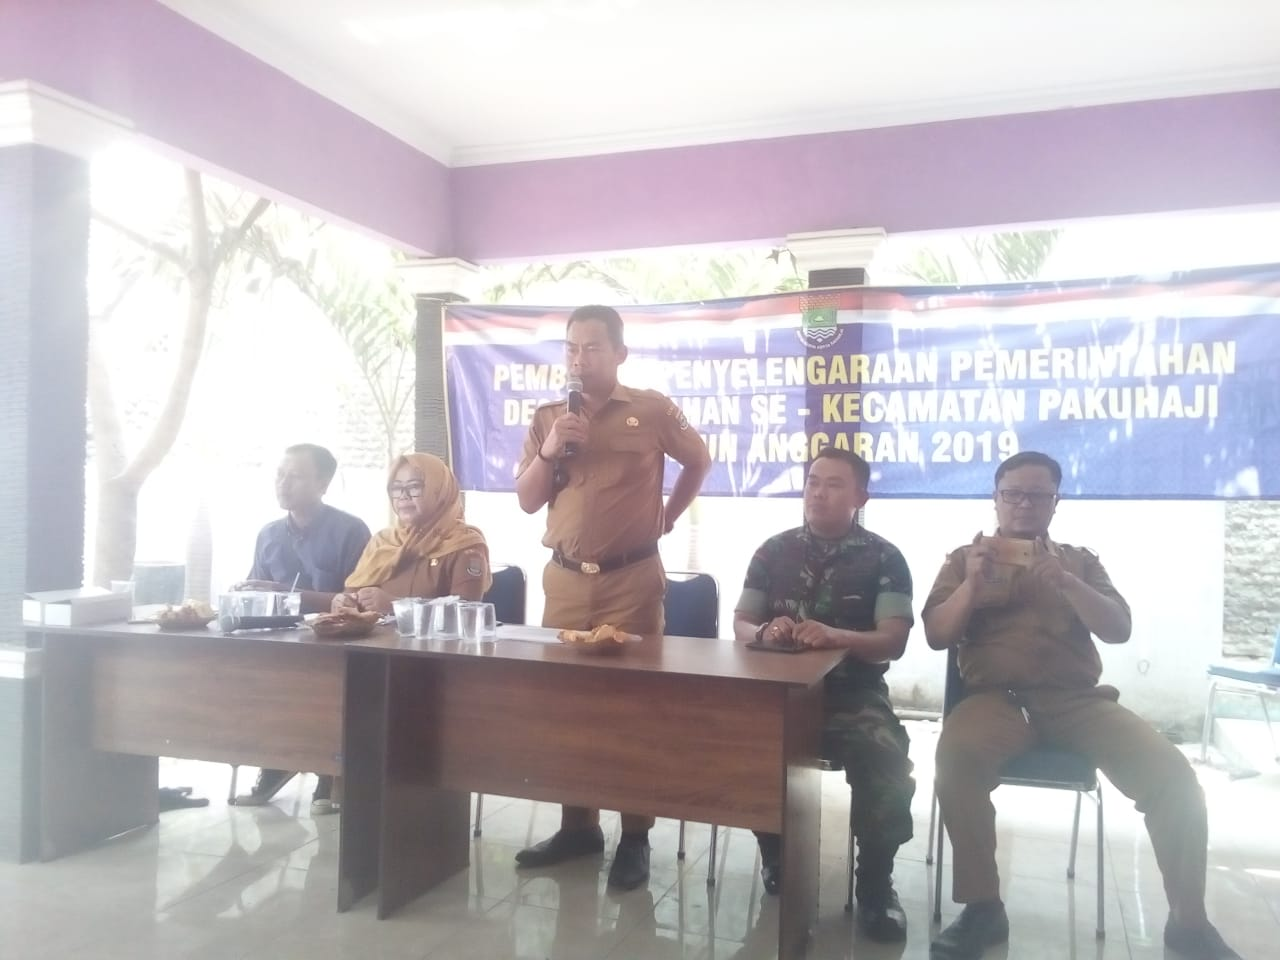 Desa Kalibaru Ekspos Realisasi APBDes 2019